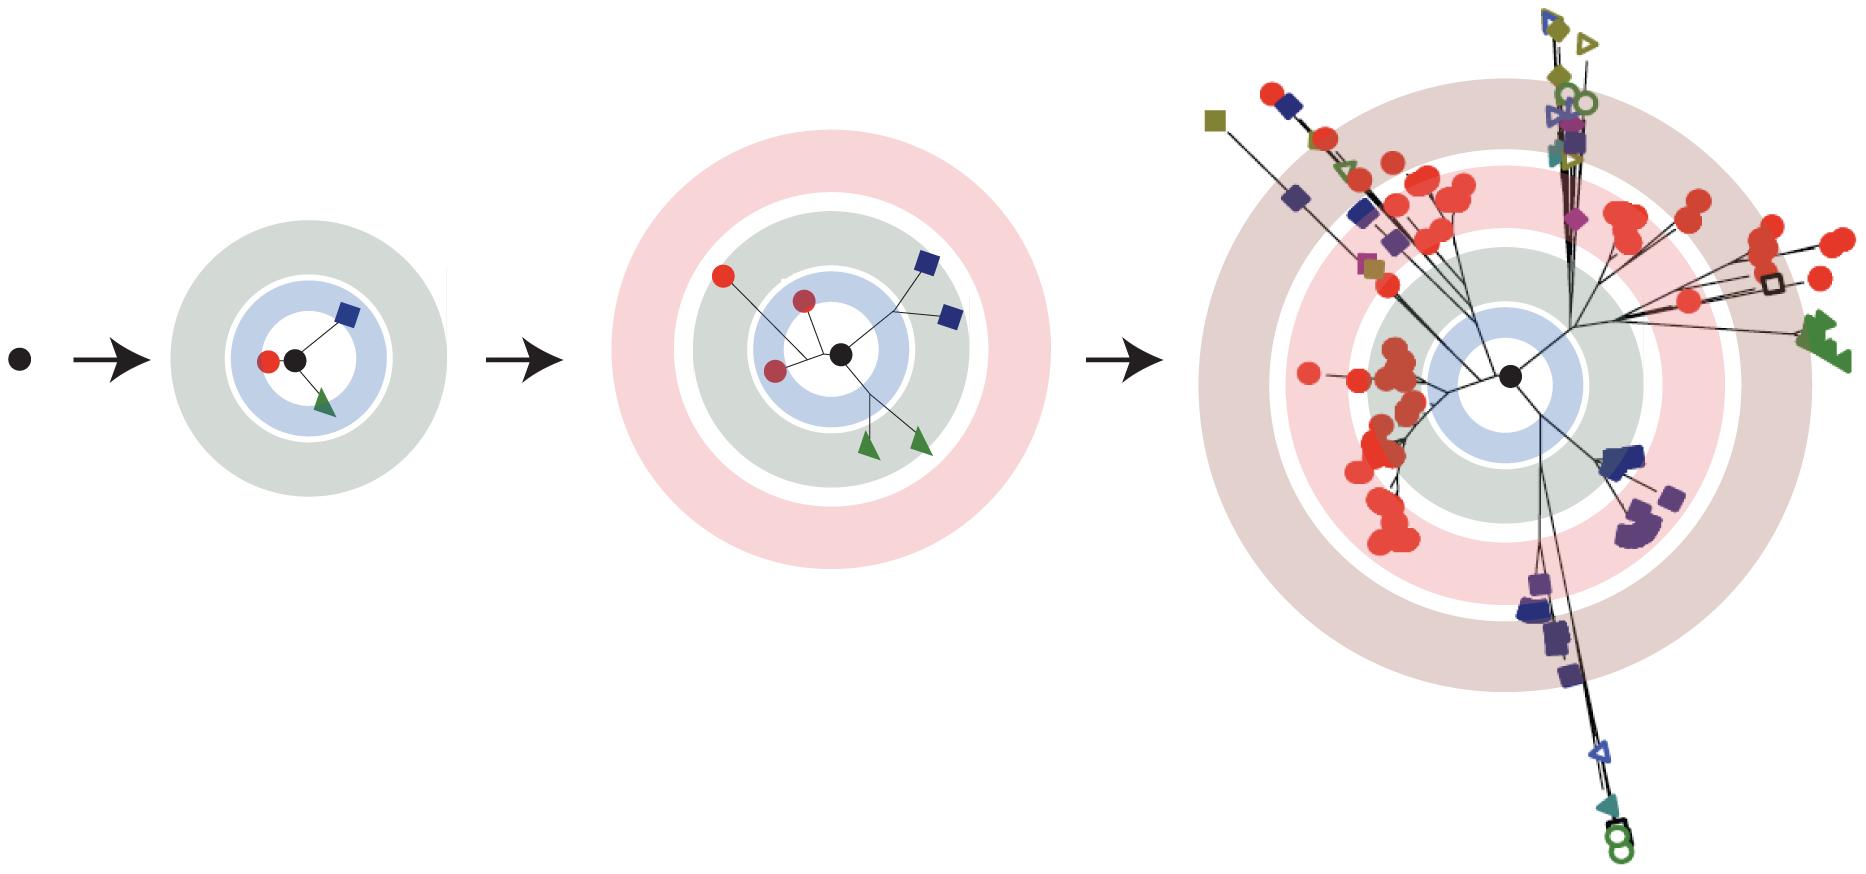 RNA viruses exist as a quasispecies.